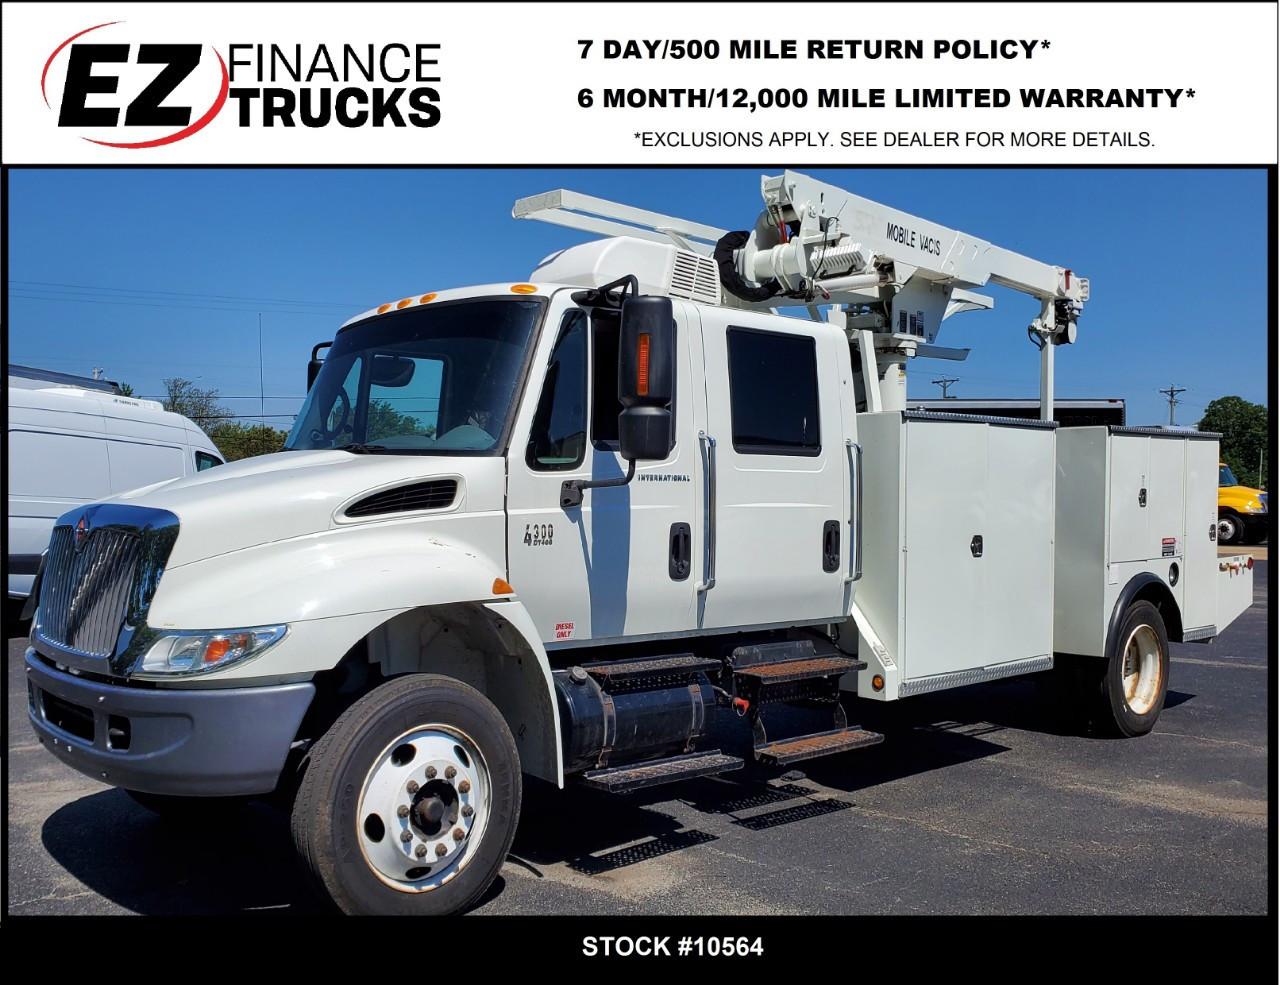 Used, 2004, INTERNATIONAL, 4000, Crane Truck